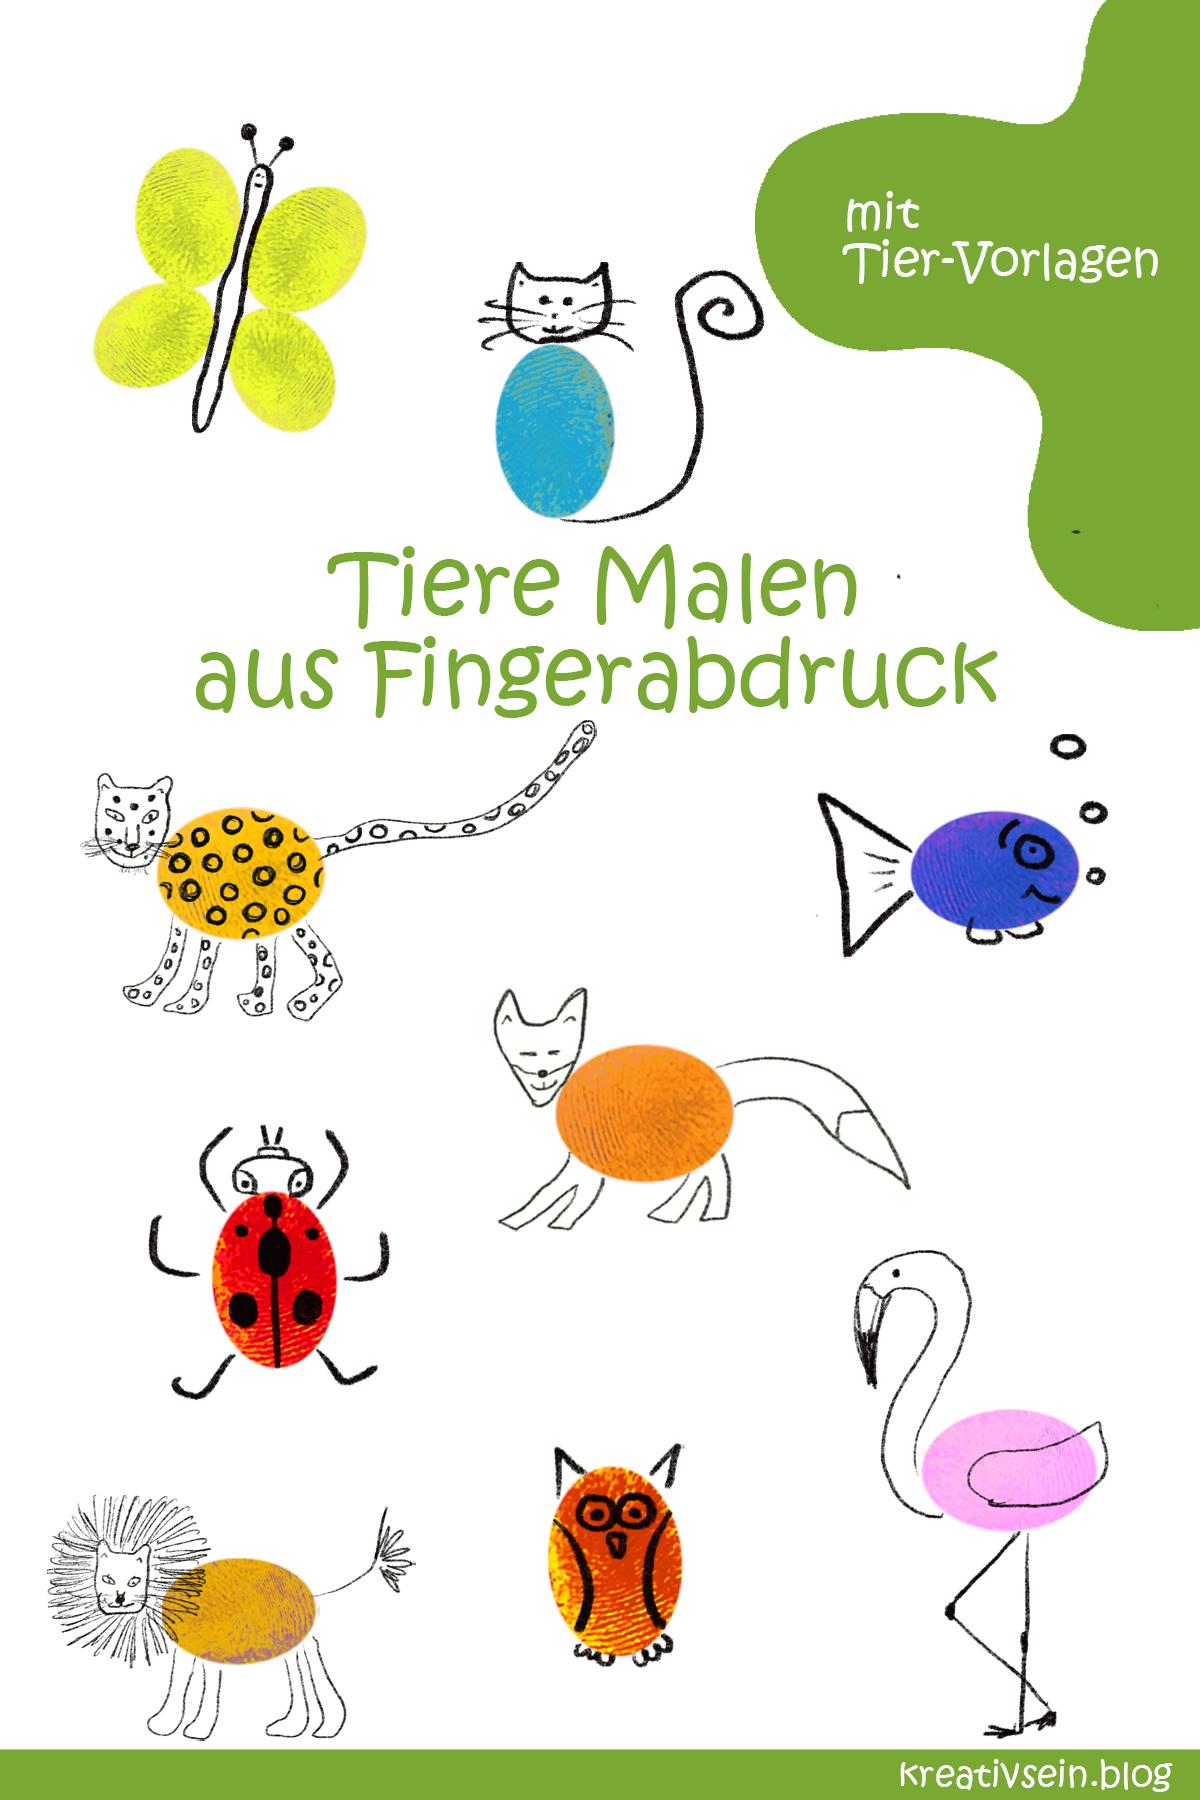 Fingerabdruck Tiere Malen